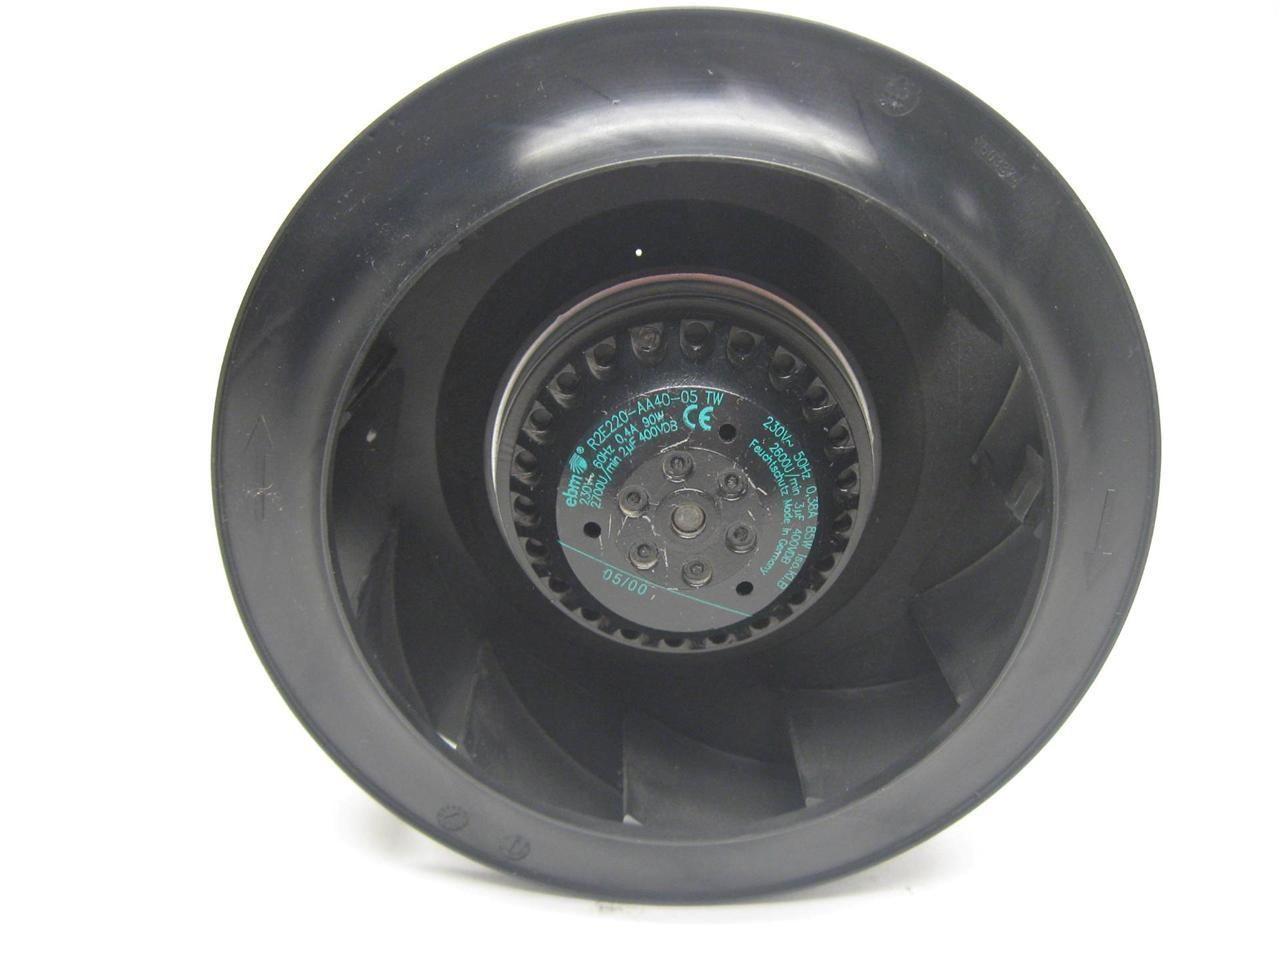 Ebm R2e220 1140 05 Motorized Impeller Fans Blowers